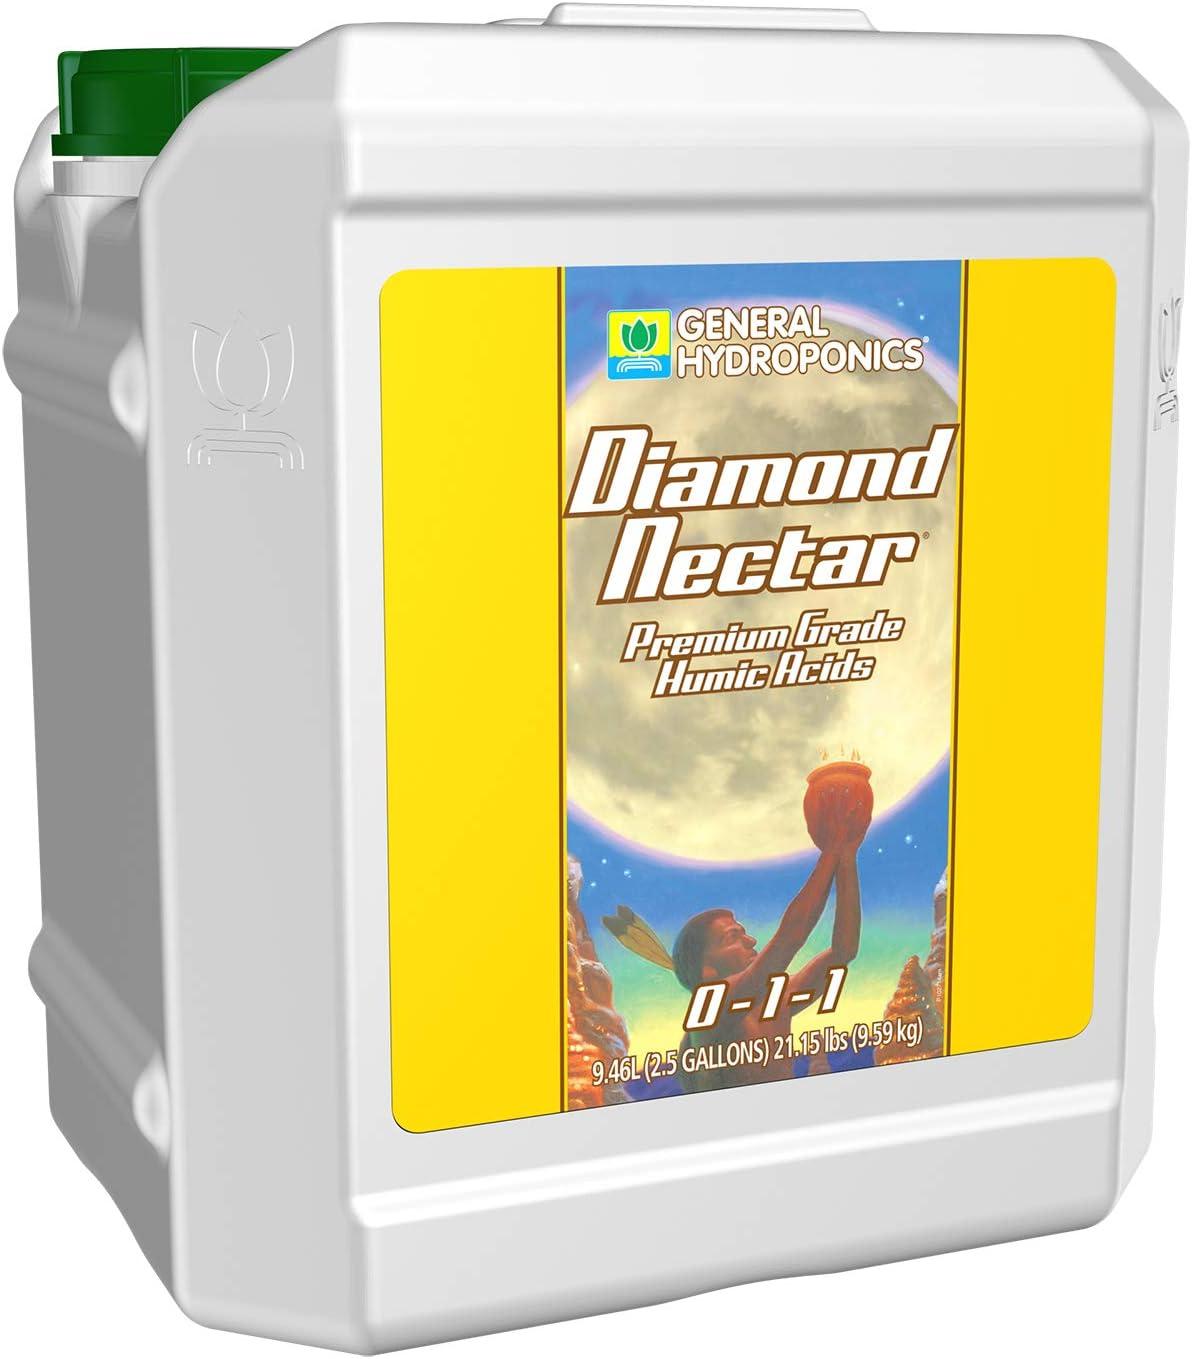 General Hydroponics HGC732170 Diamond Nectar 0-1-1 Premium Grade Humic Acid for Soil, Soilless Mixes, Coco & Hydroponics 2.5-Gallon